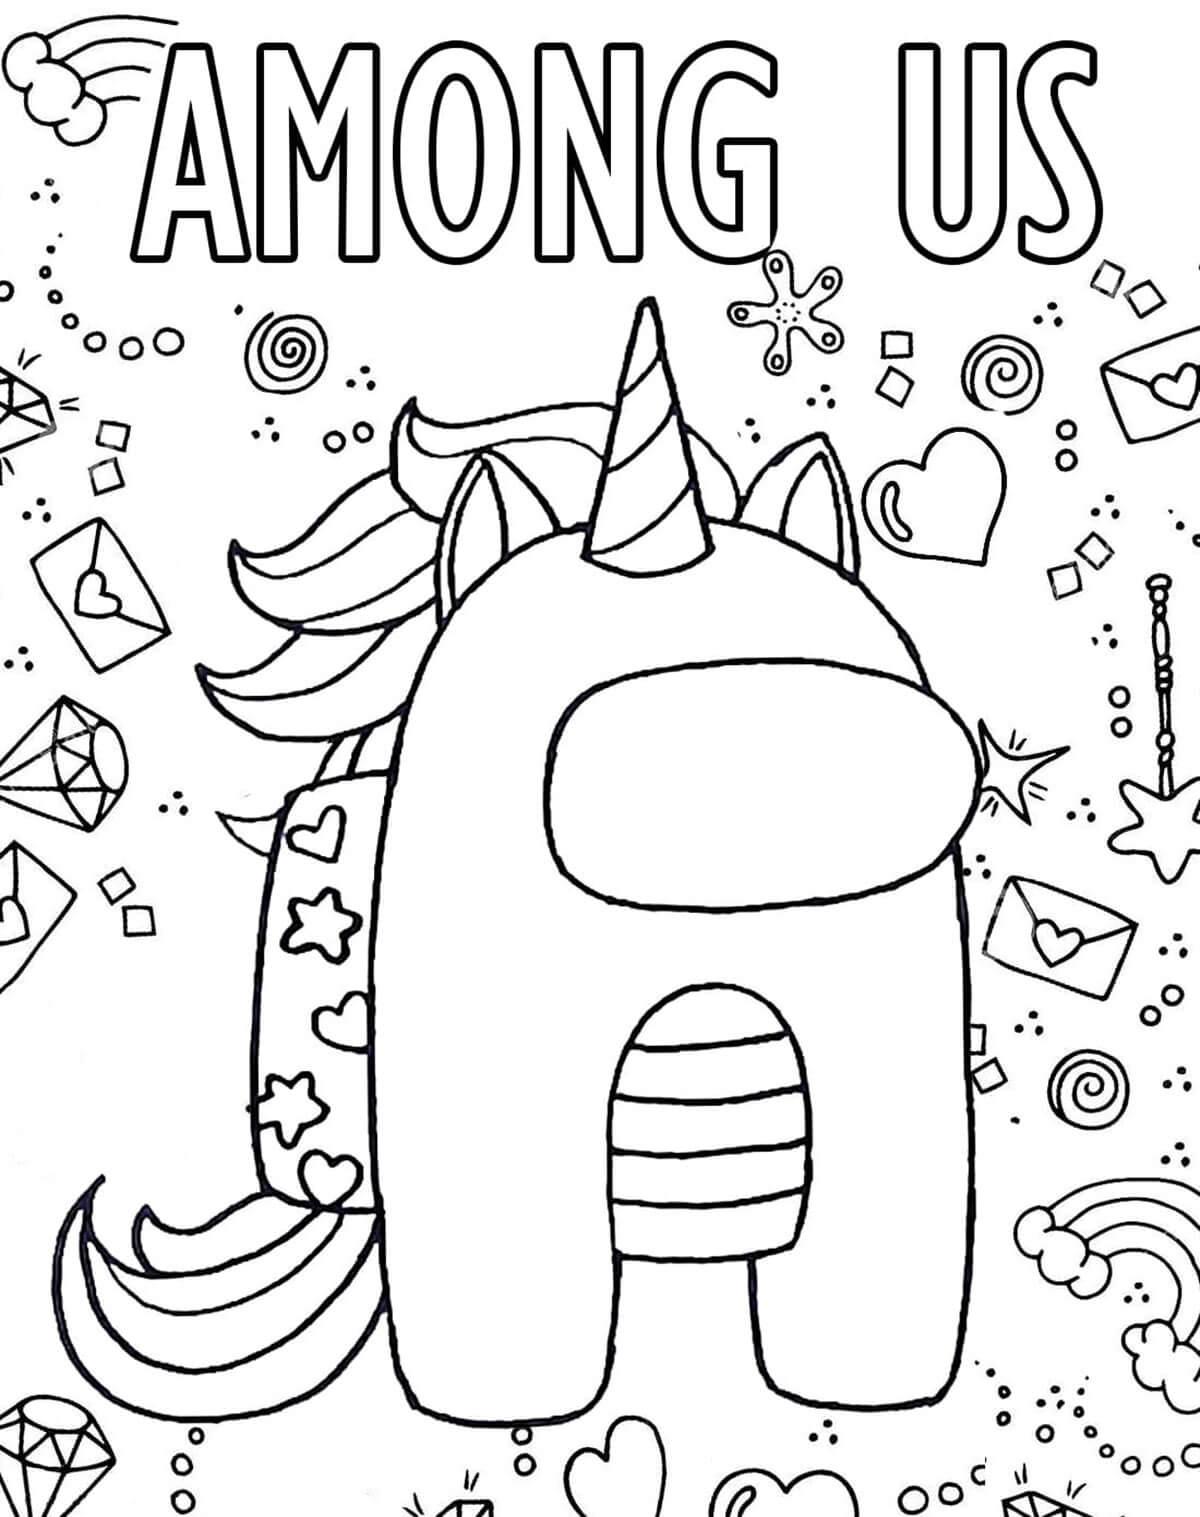 Among us ver. unicorn Coloring Page